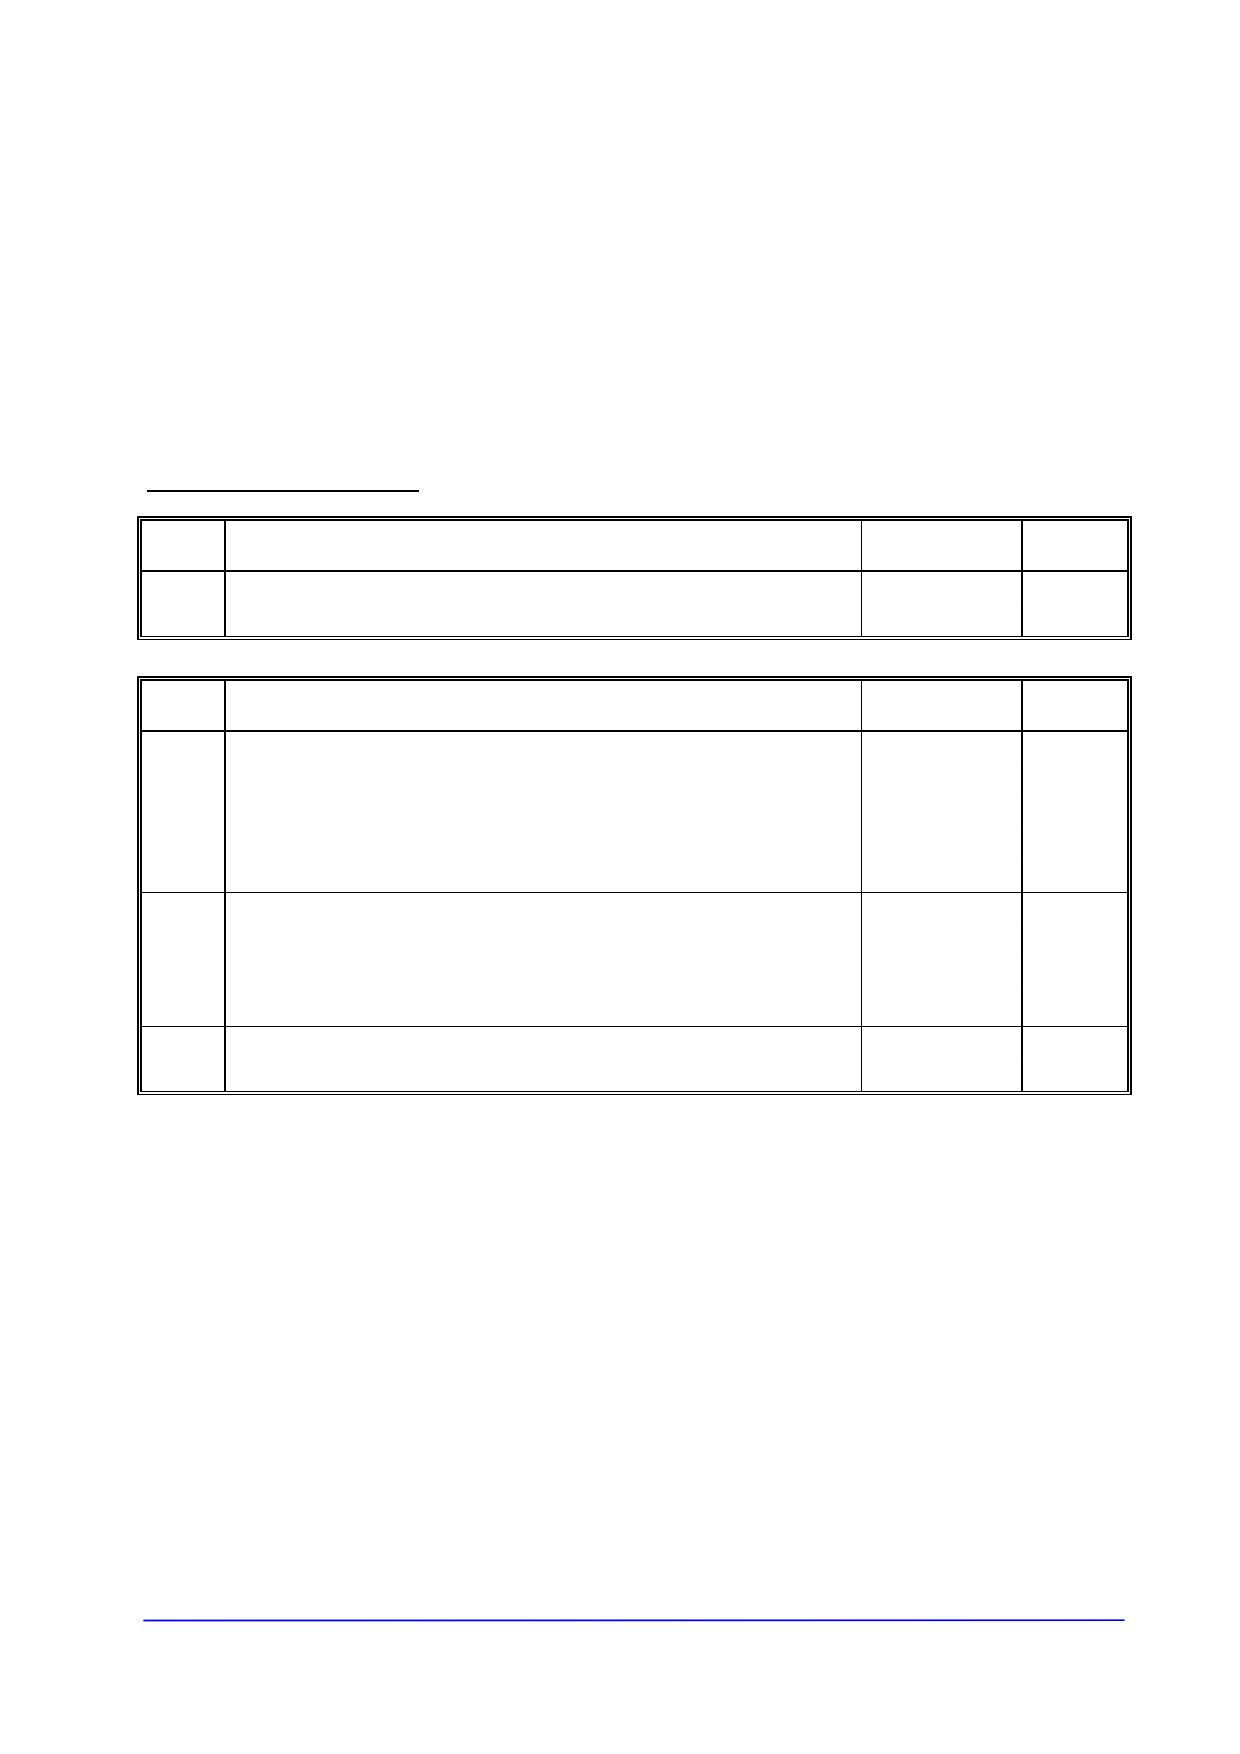 M0588LC440 دیتاشیت PDF